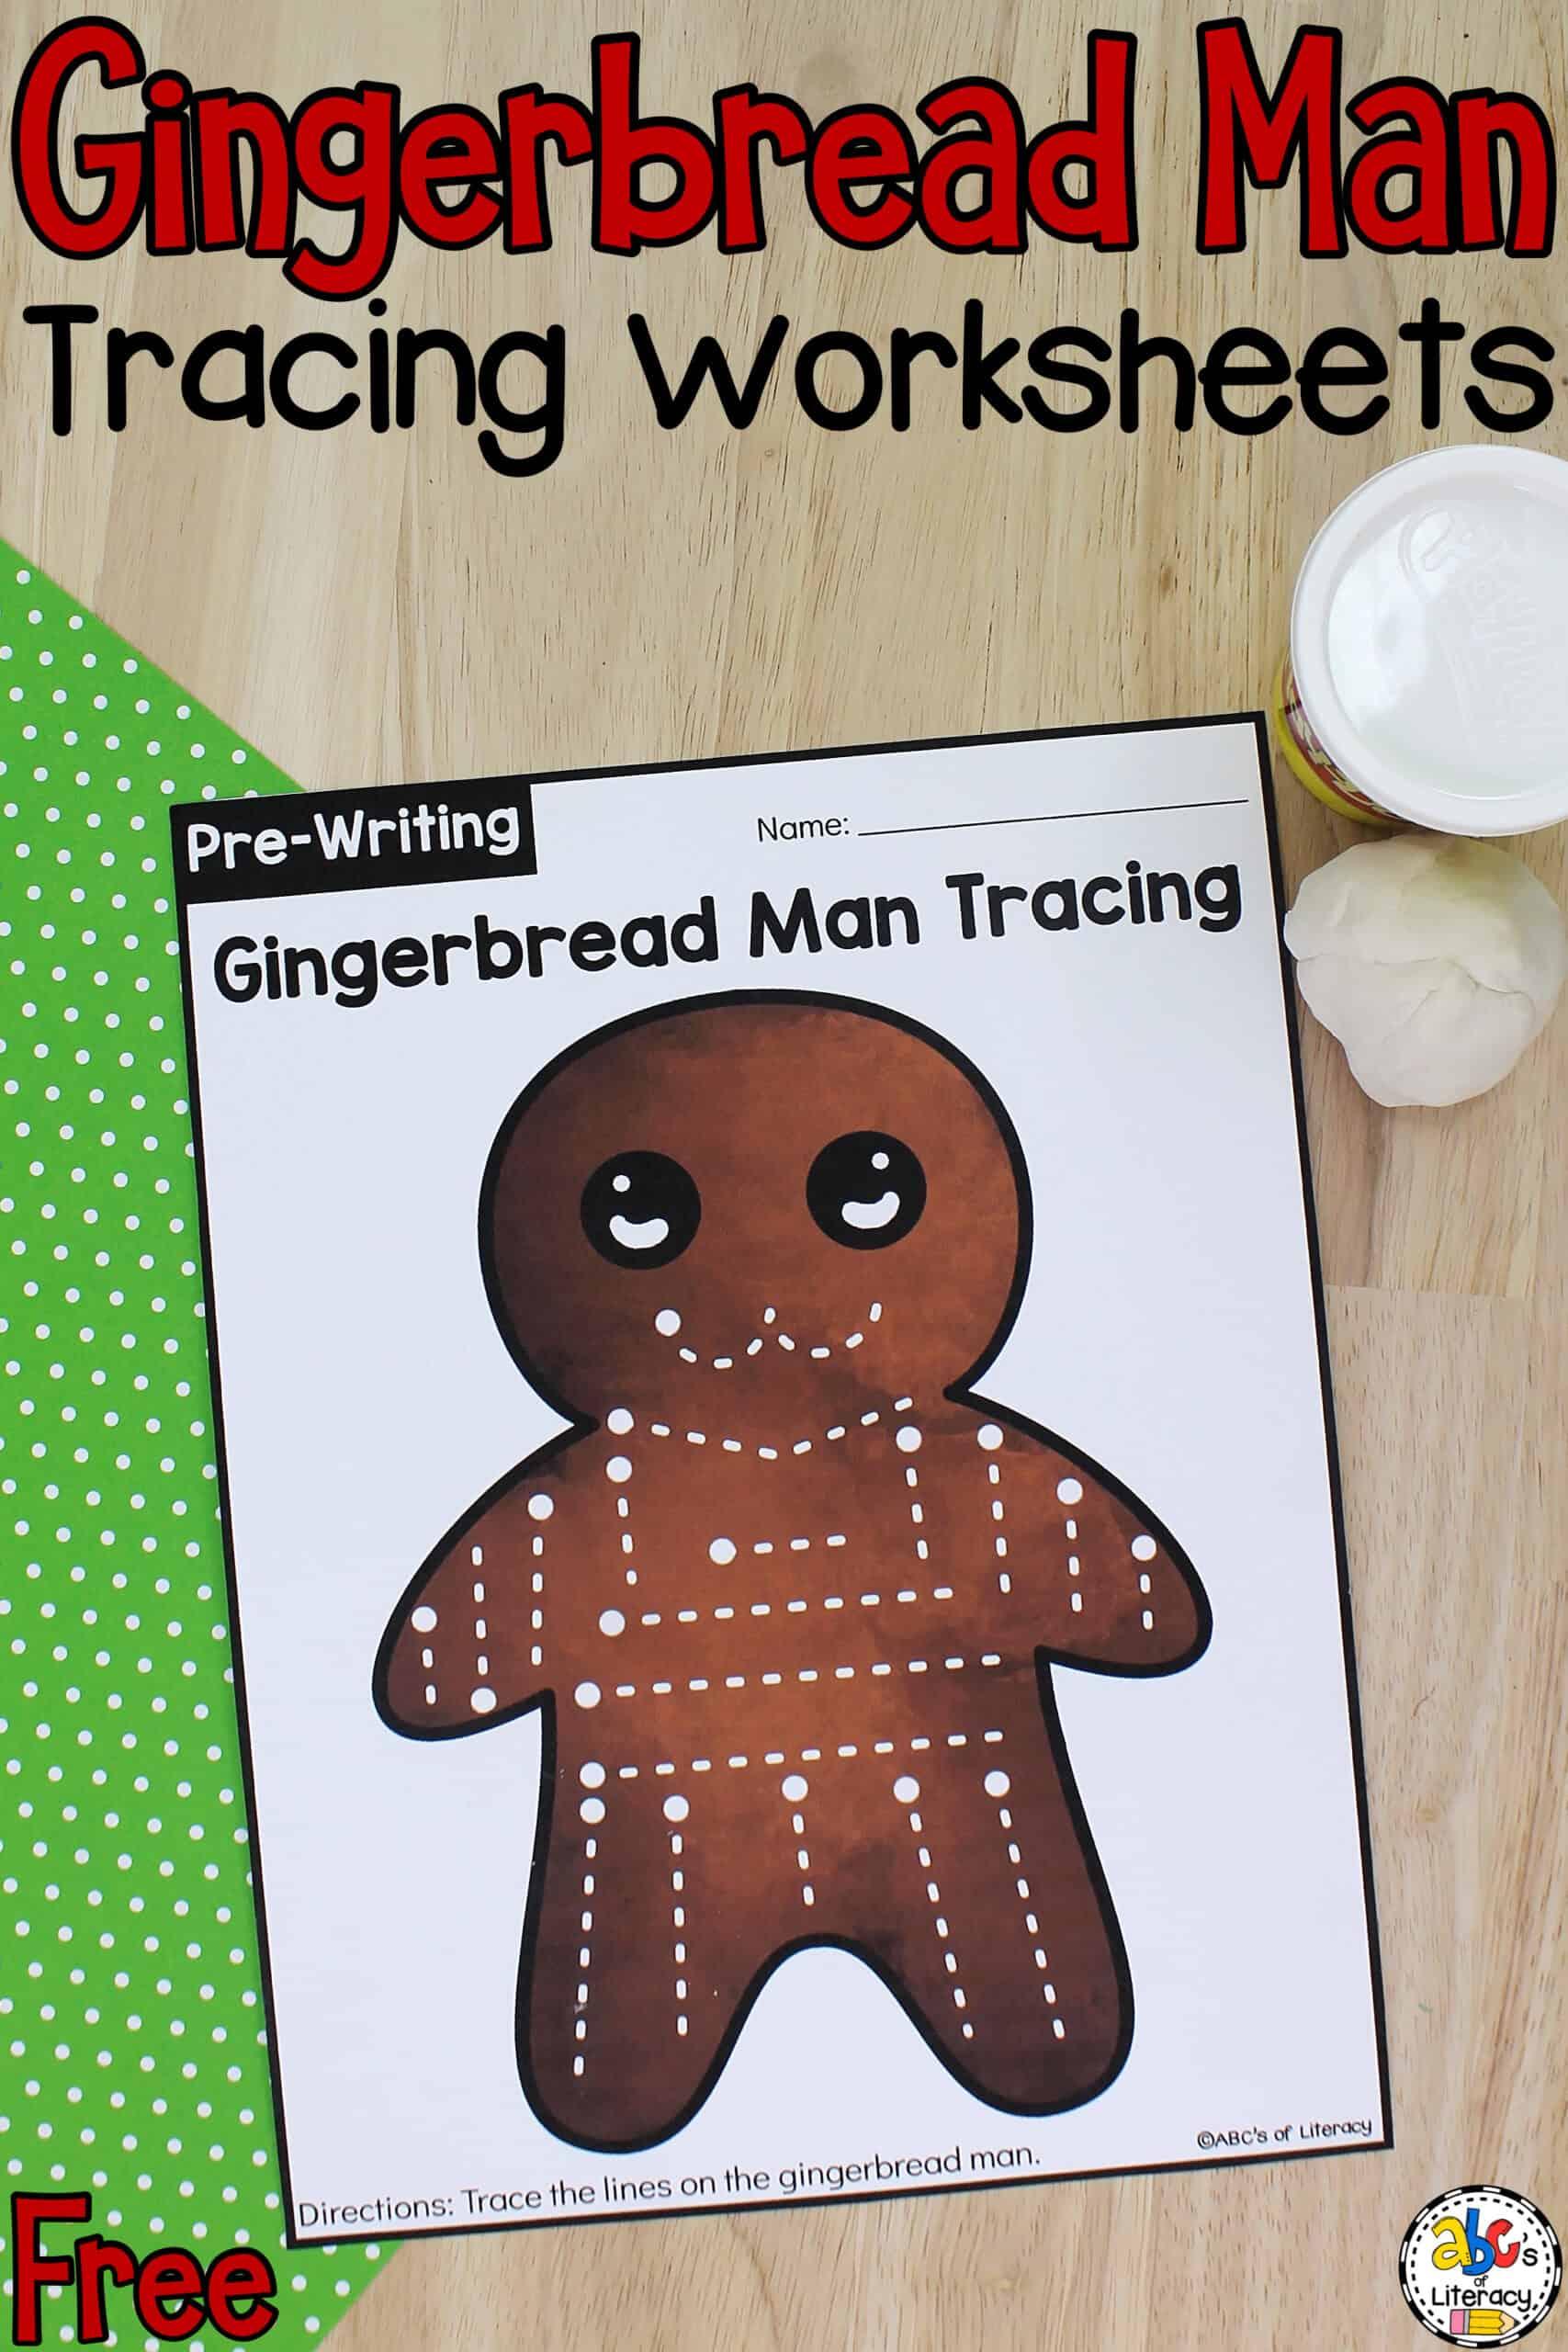 Gingerbread Man Tracing Worksheets